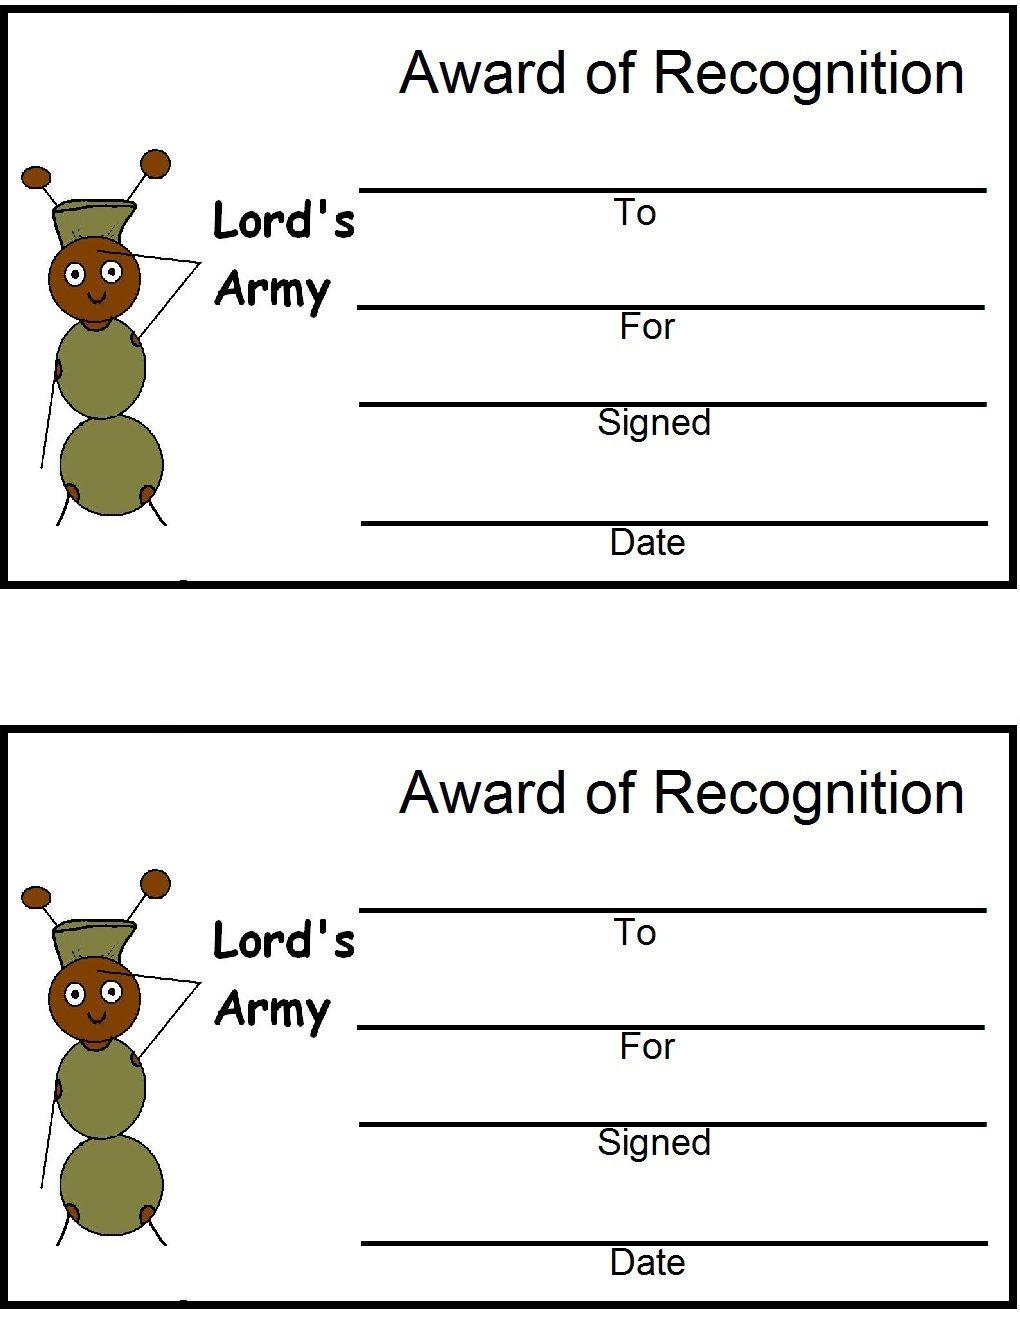 Award certificate template clipart vbs bible boot camp award certificate template clipart yelopaper Gallery